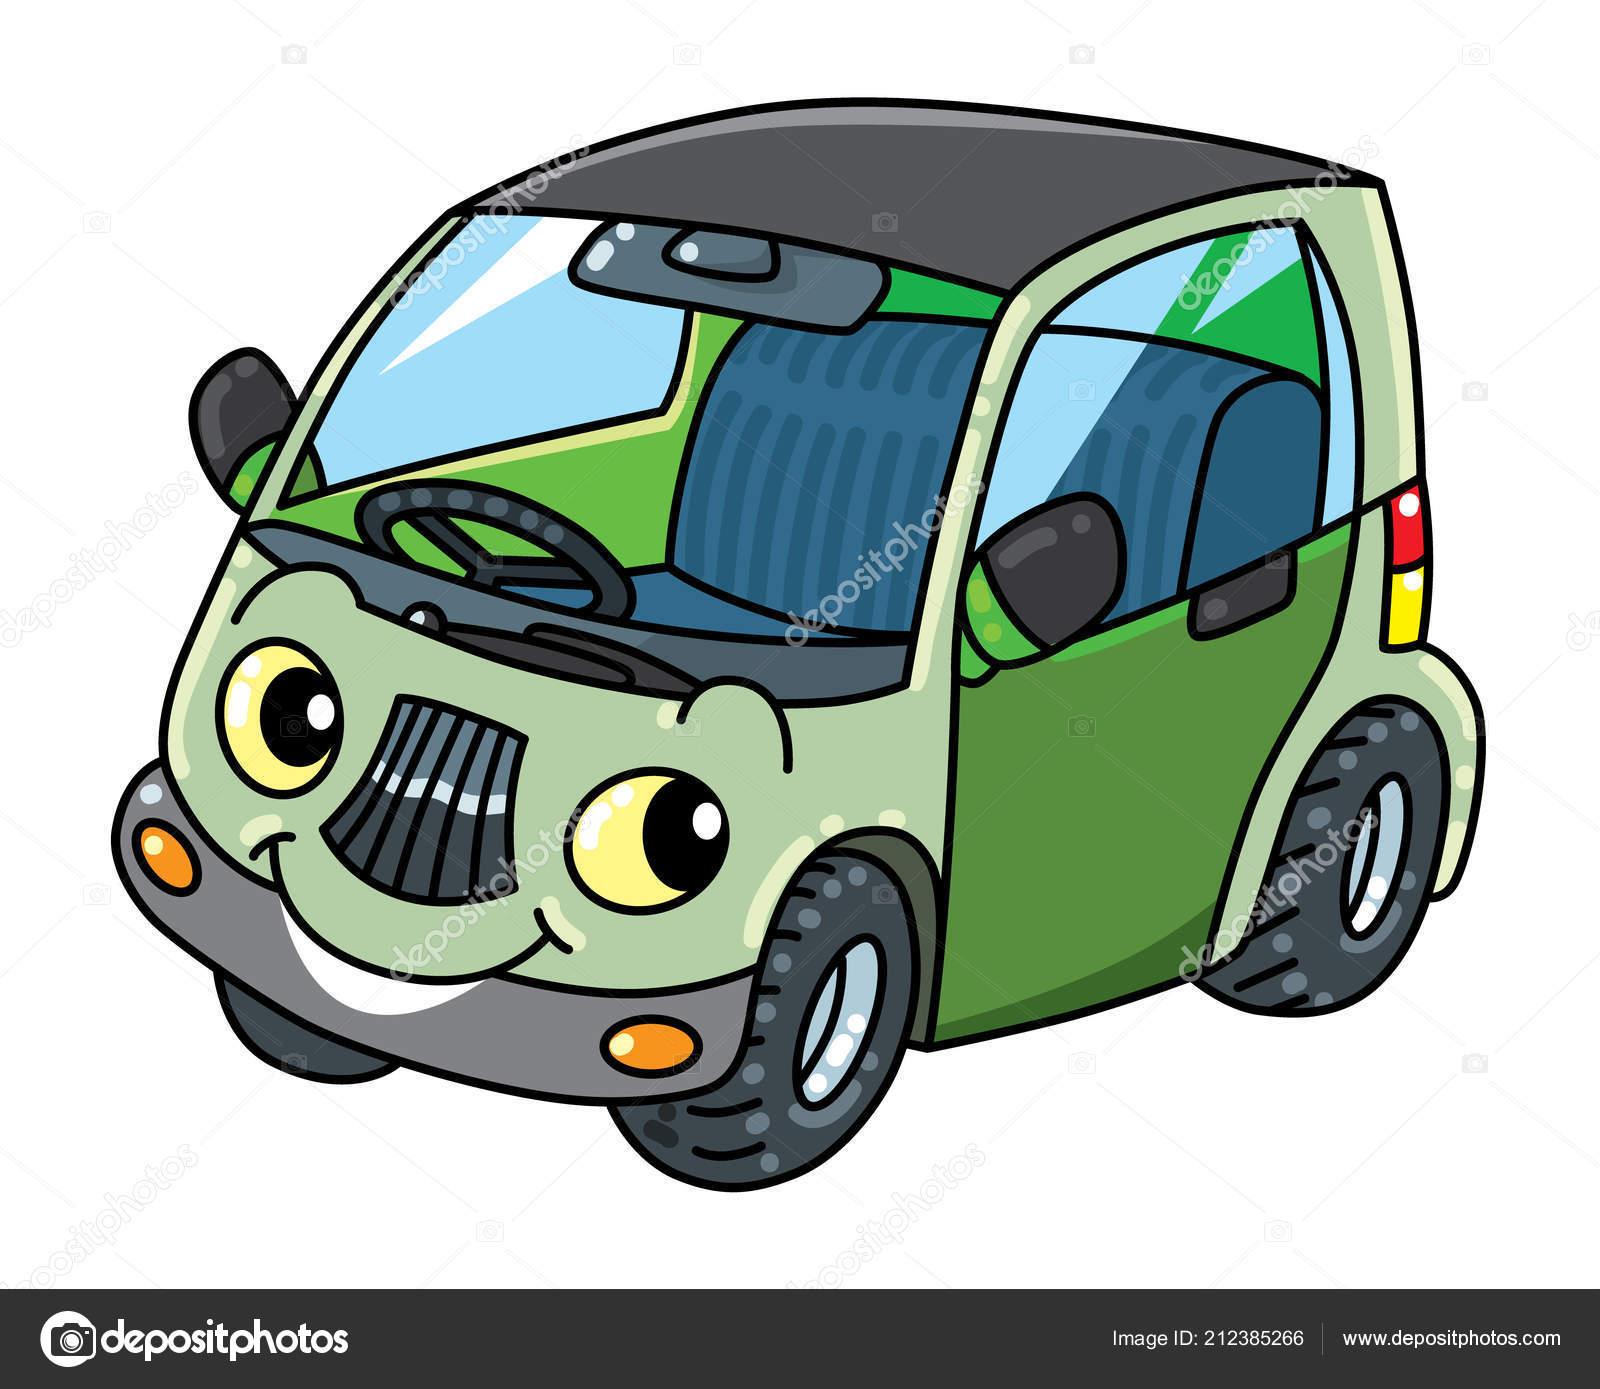 grappige kleine auto met ogen vectorillustratie. Black Bedroom Furniture Sets. Home Design Ideas